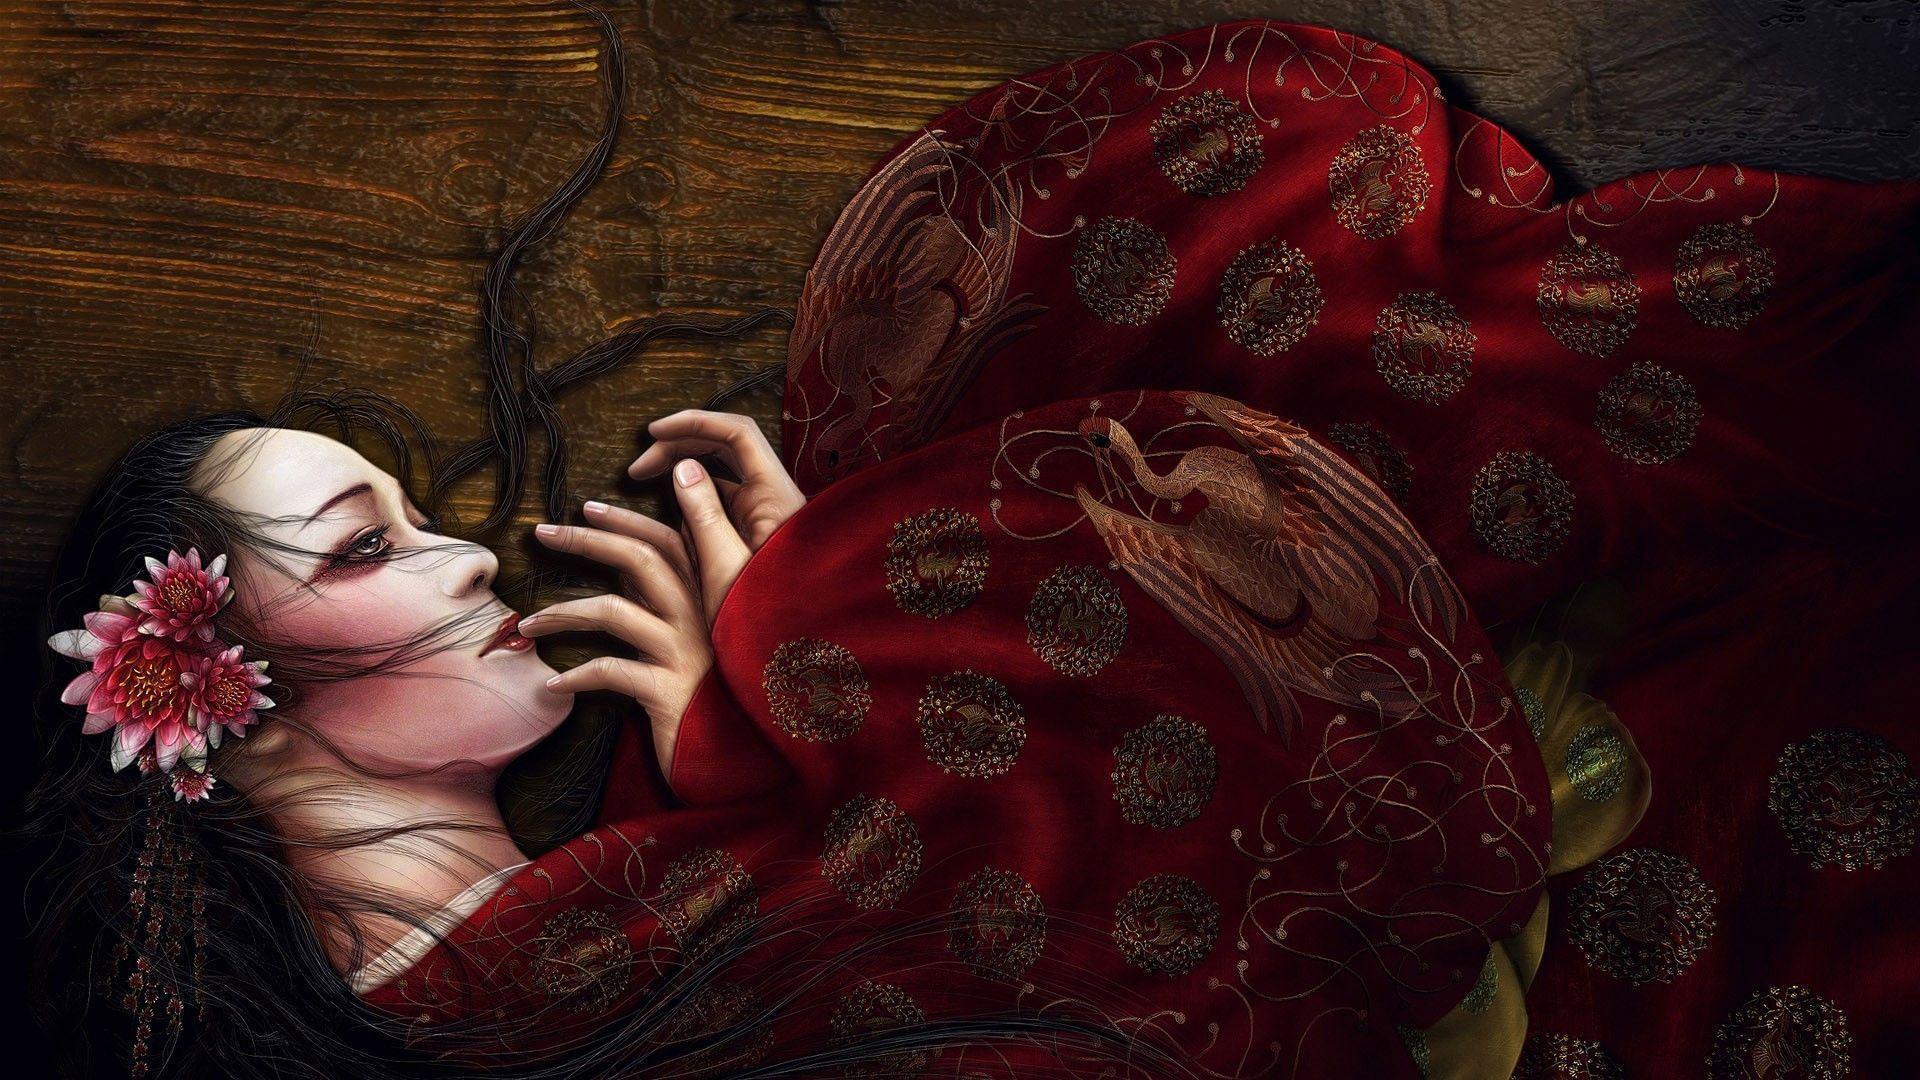 Geisha Wallpapers 1920x1080